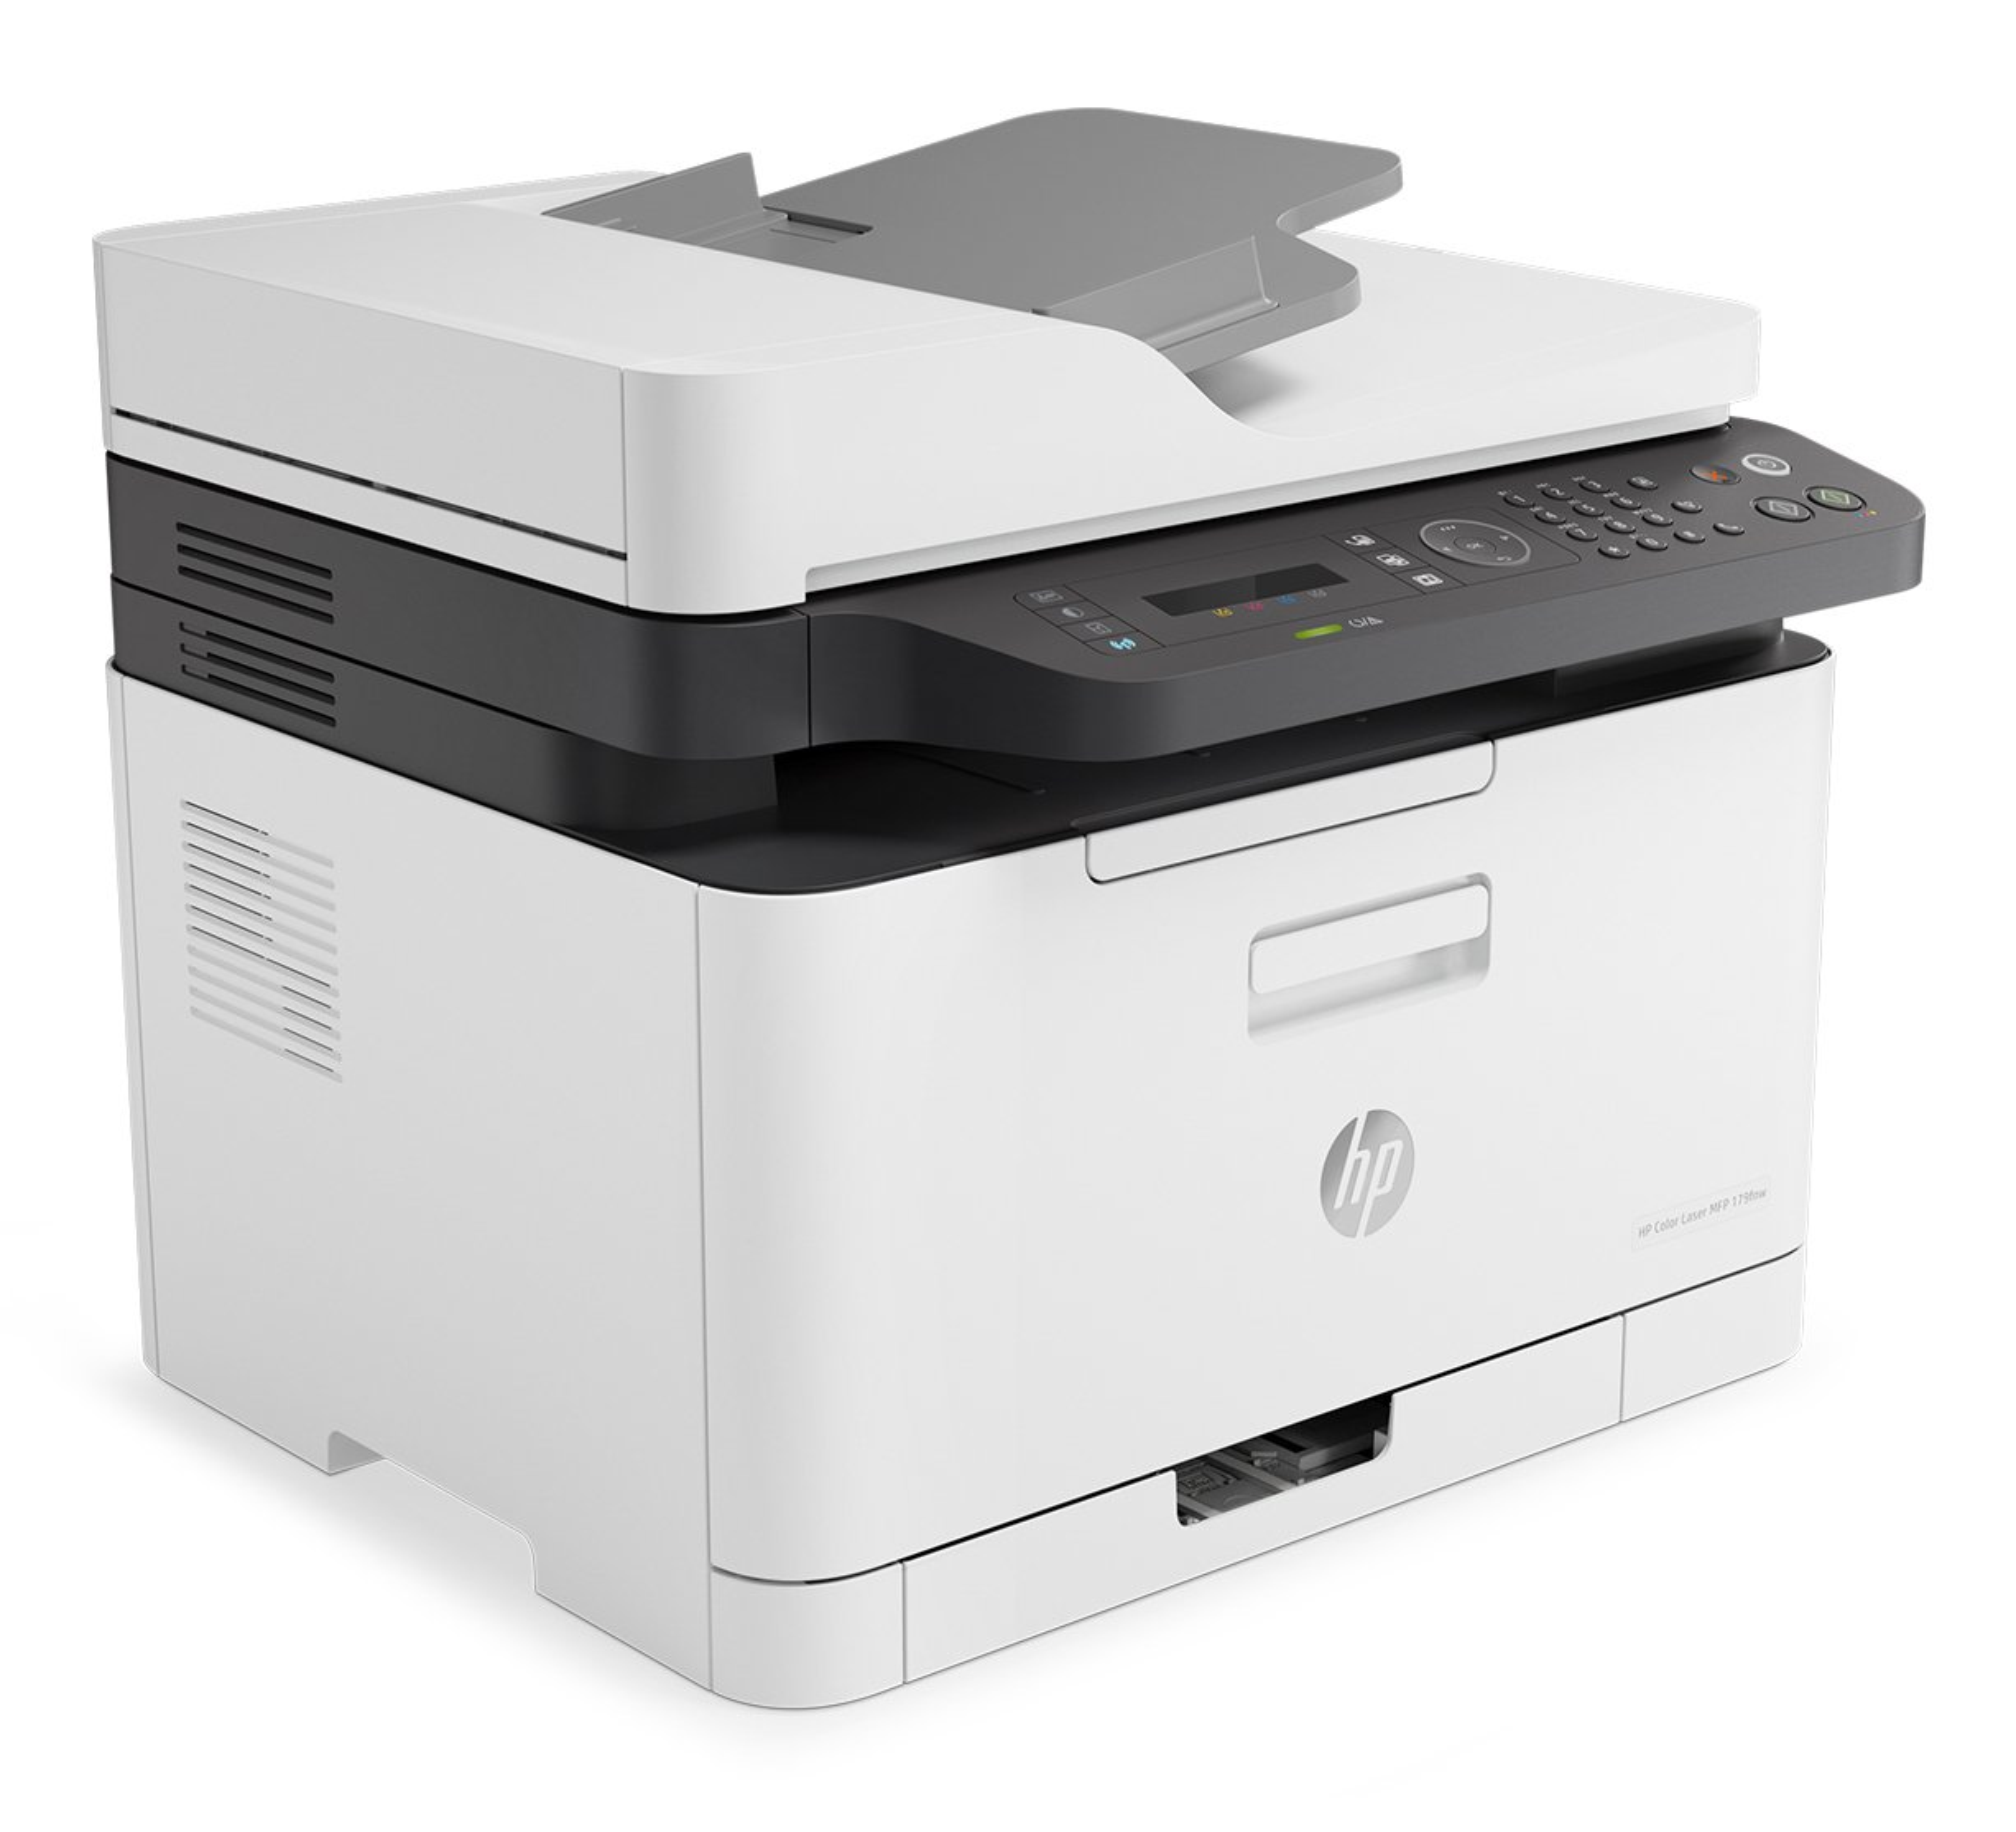 HP LaserJet MFP 179FNW Wireless Colour Laser Printer